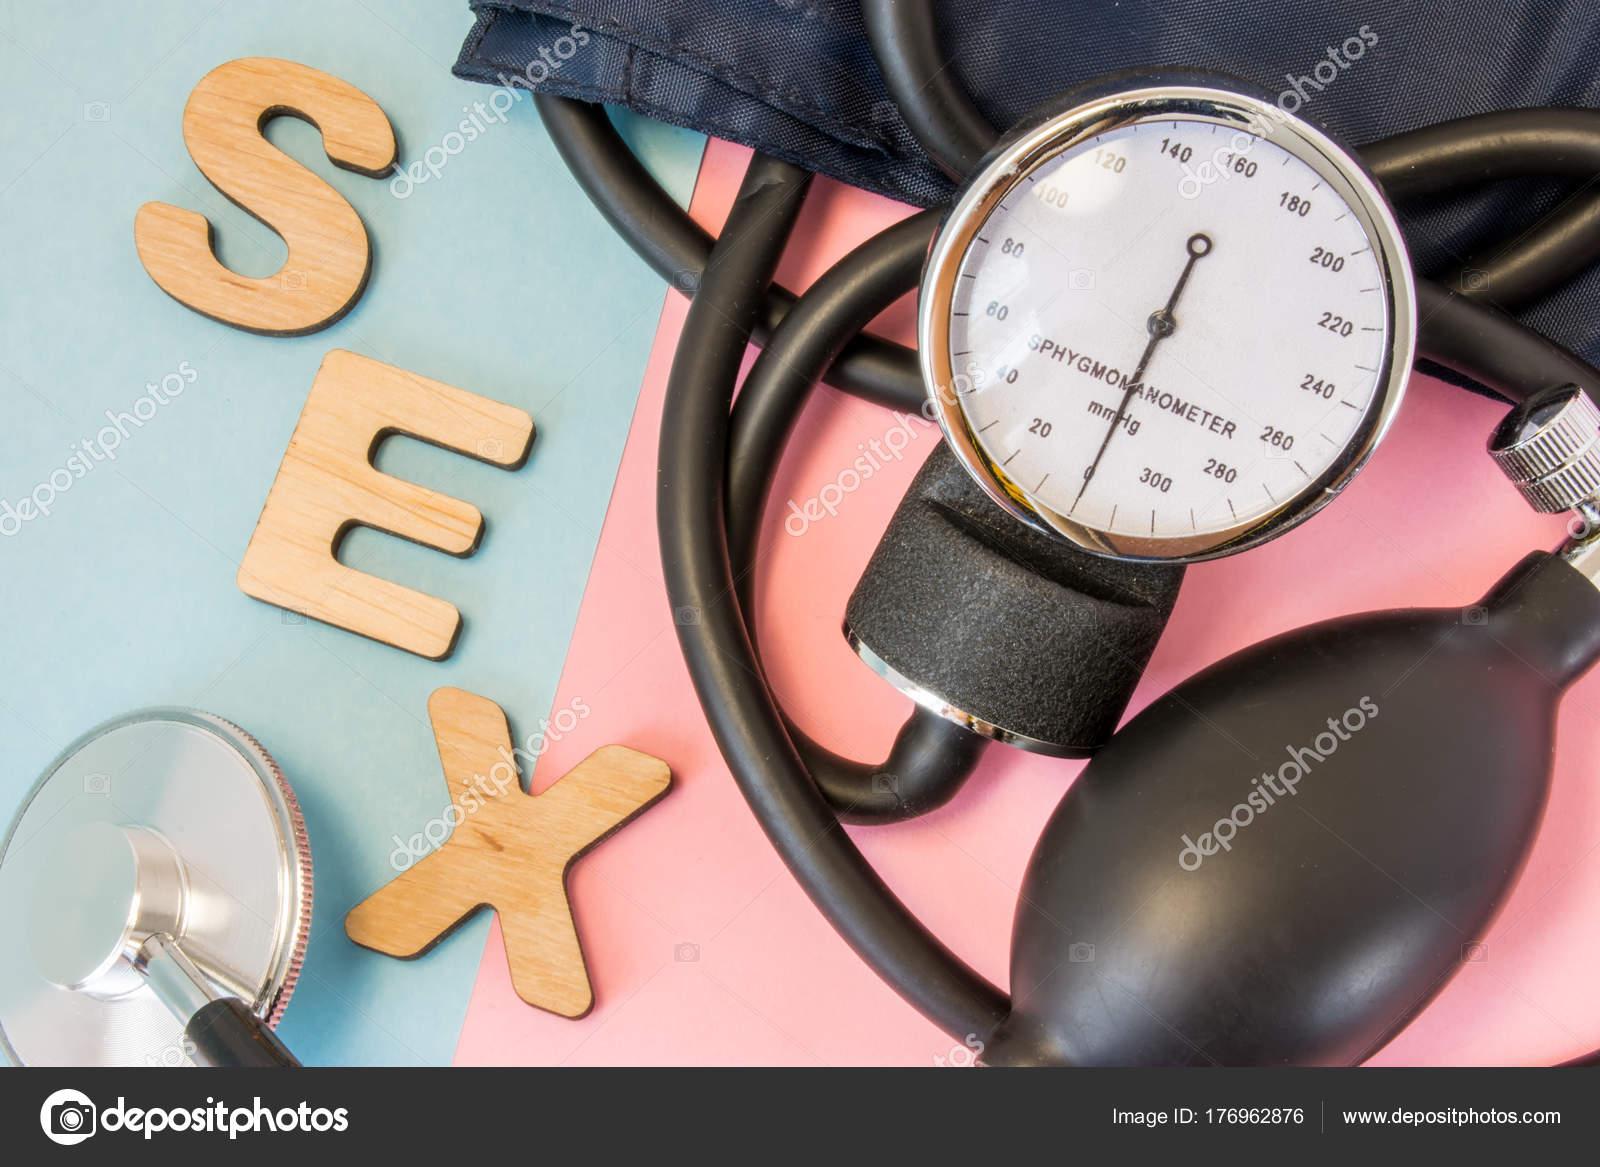 Секс и кровяное давление